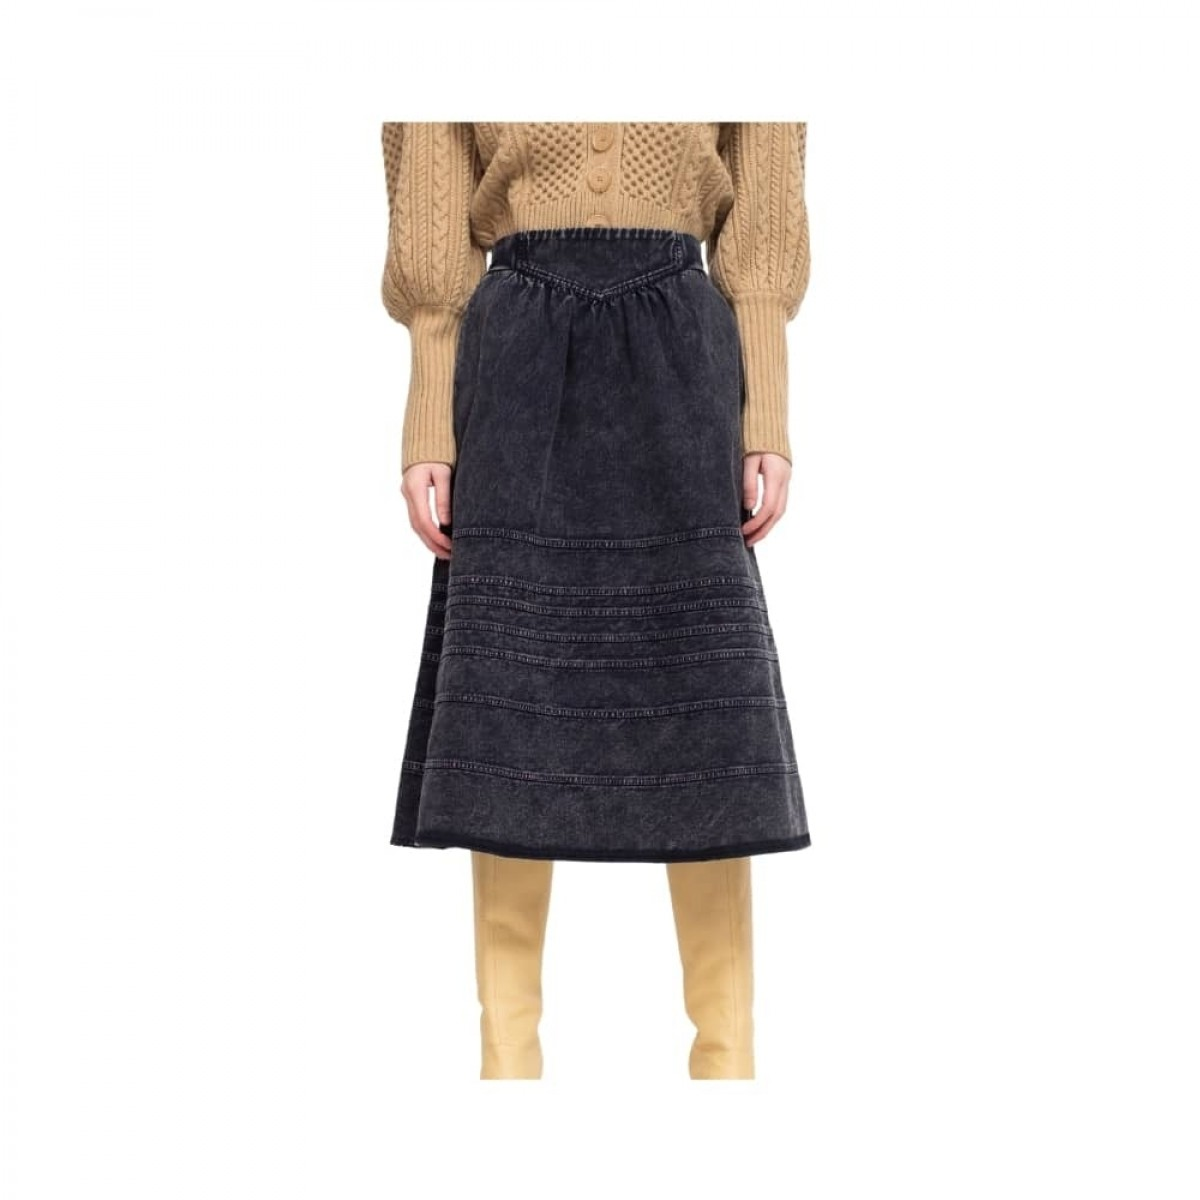 maura denim skirt - navy - front